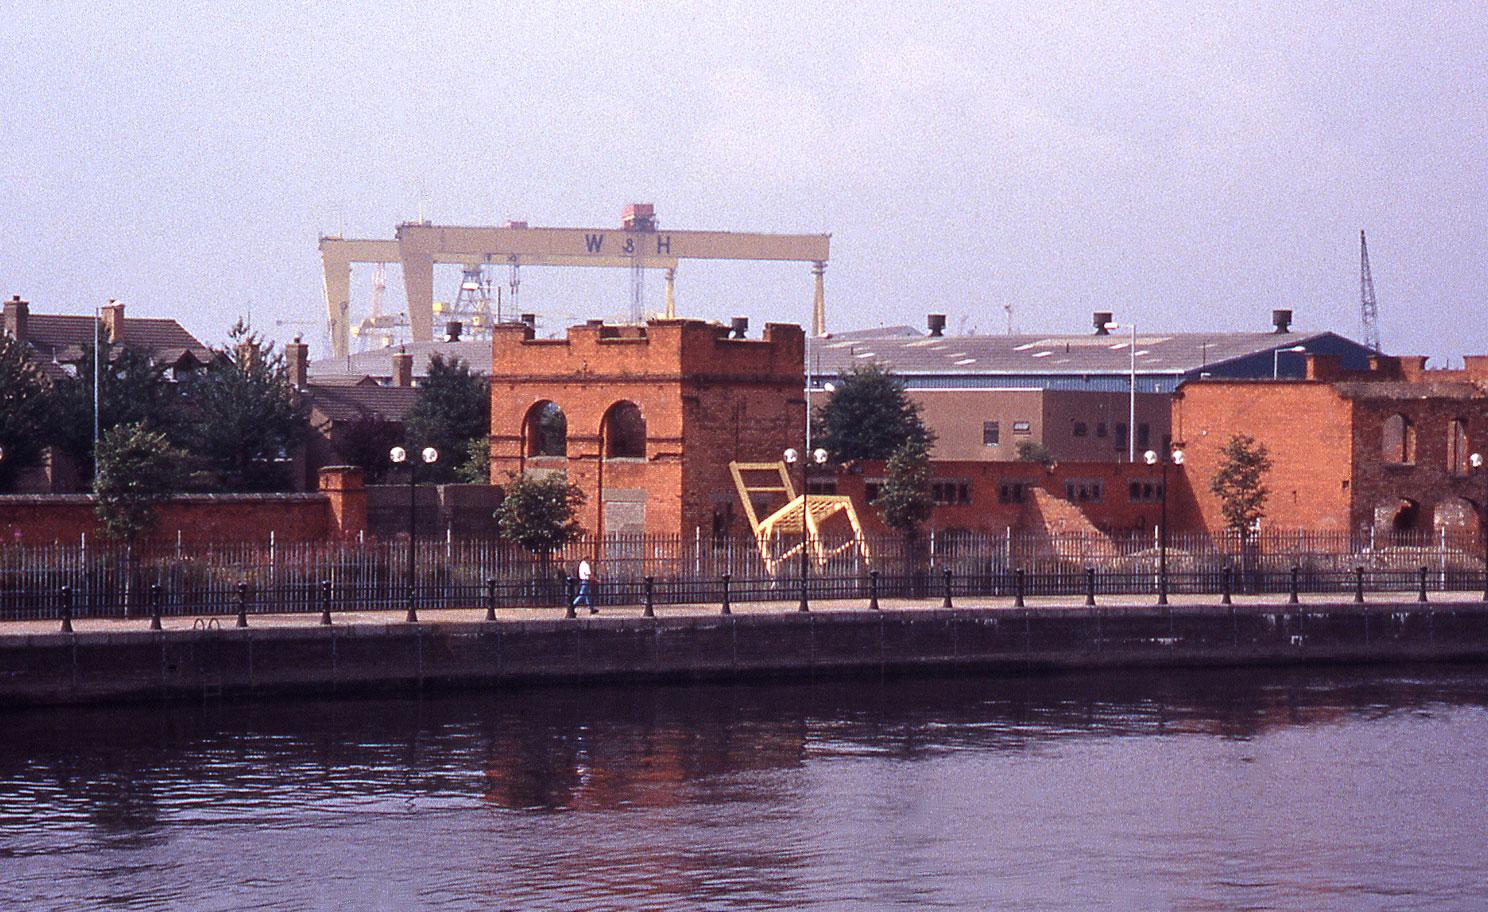 sculpture-tom-gormally-belfast-ireland-watching-river-flow.jpg